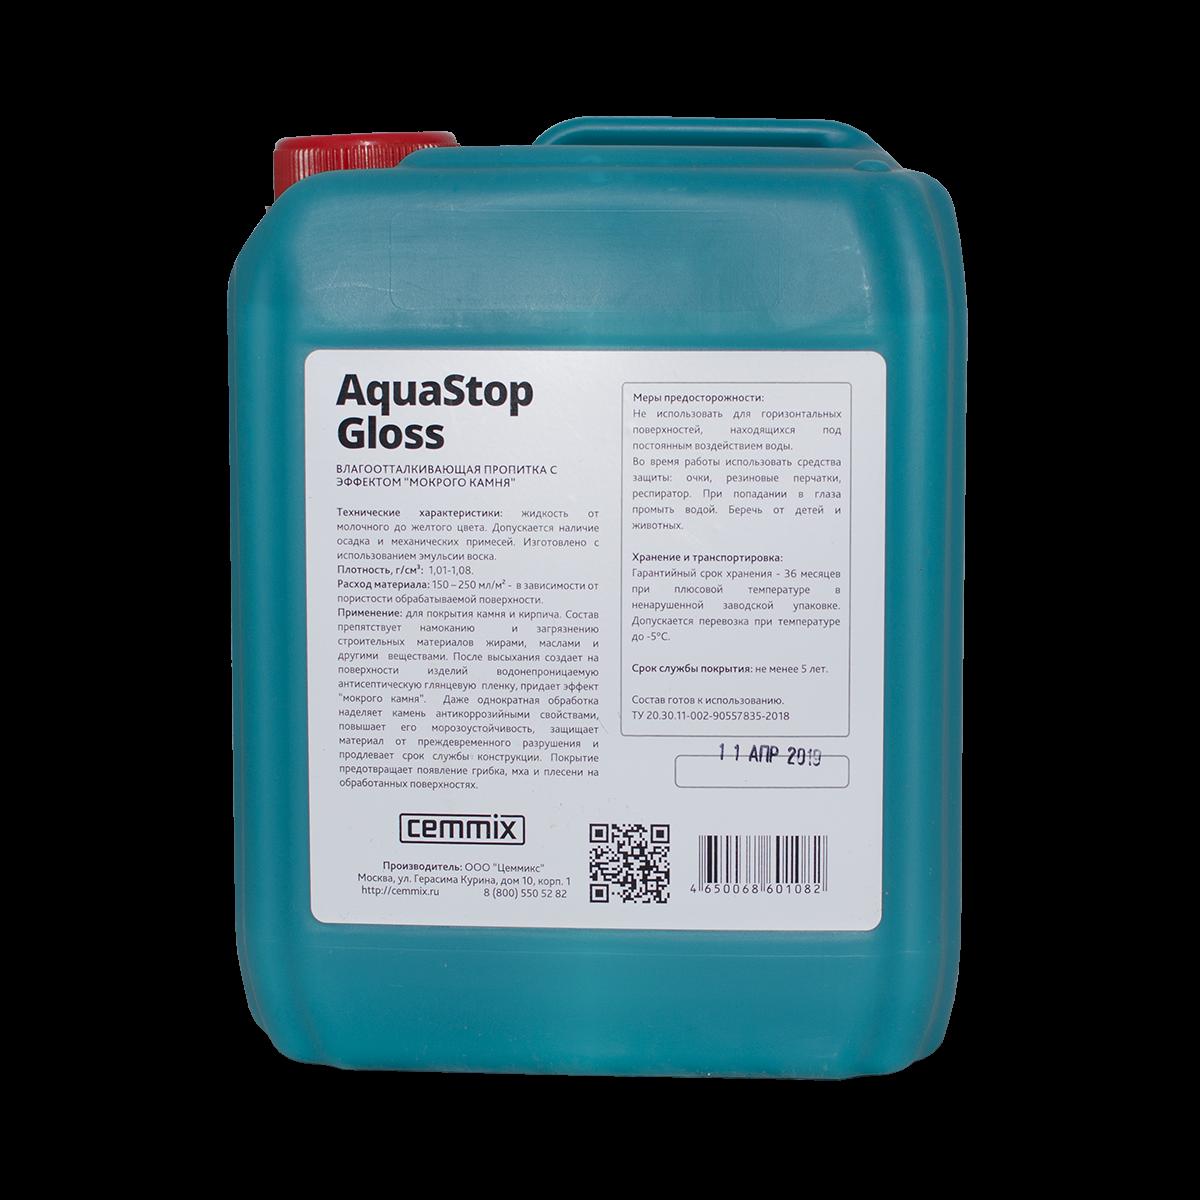 AquaStop Gloss